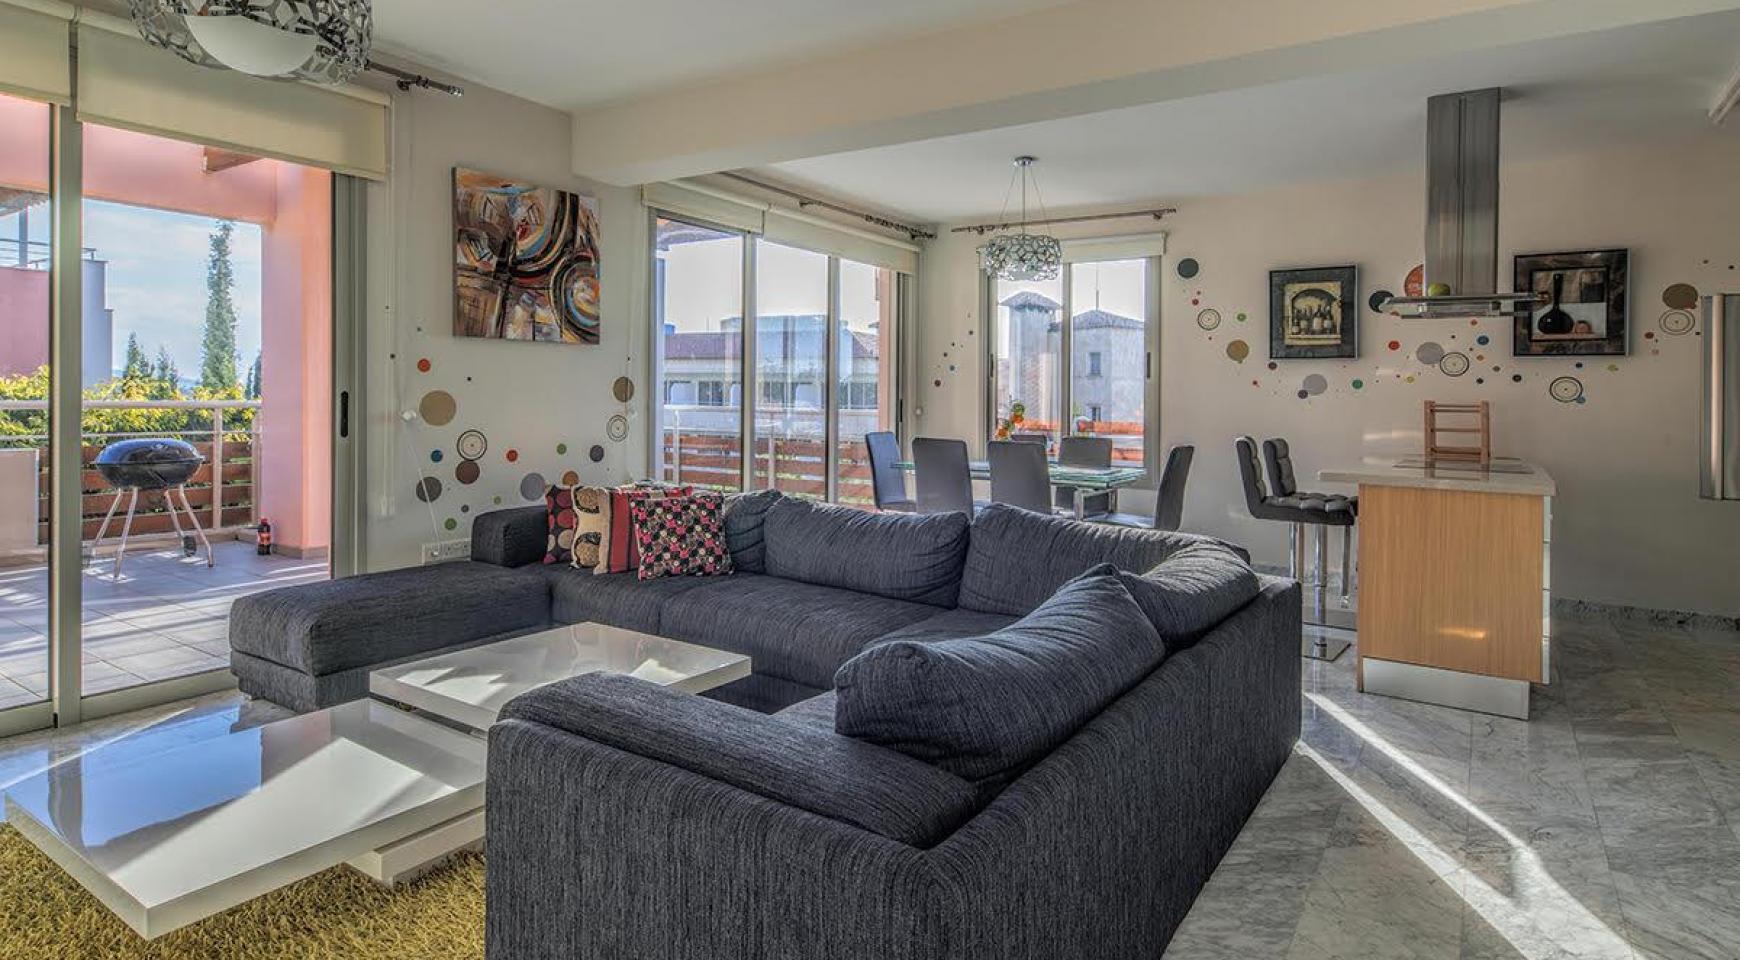 2 Bedroom Duplex Apartment Amathusa O 104 in a Prestigious Complex near the Sea  - 2